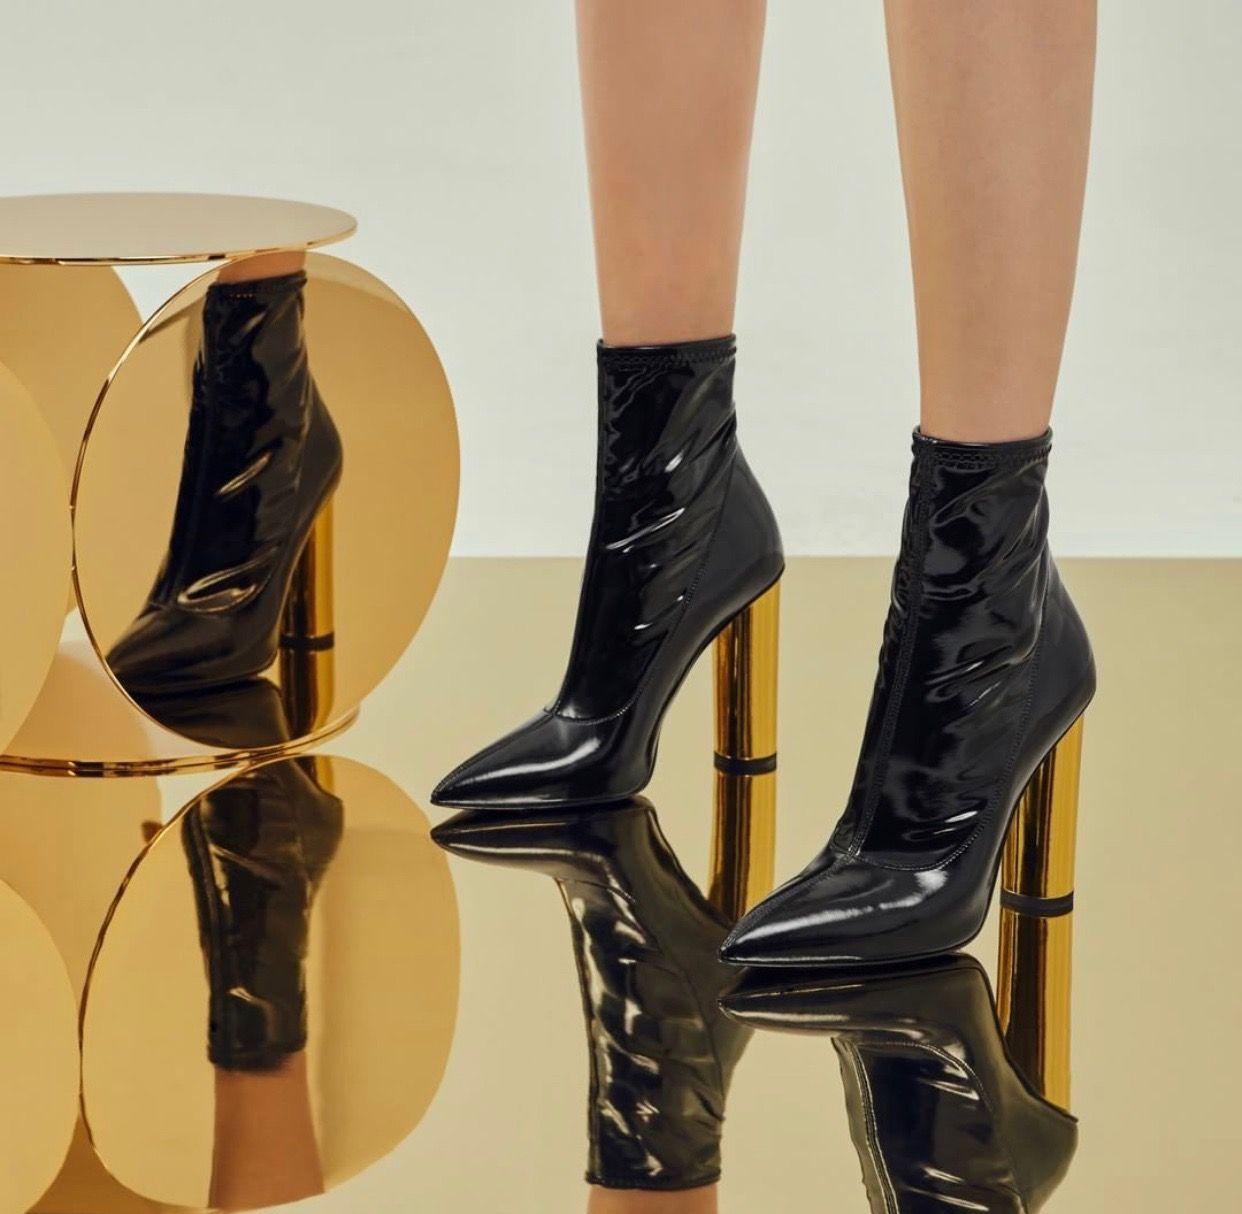 6e2cd50b6eff6 Giuseppe Zanotti The Maida Booties 2019  shoes  shoesaddict  sandals   zapatos  estilo  fashion  style  vanessacrestto  stiletto